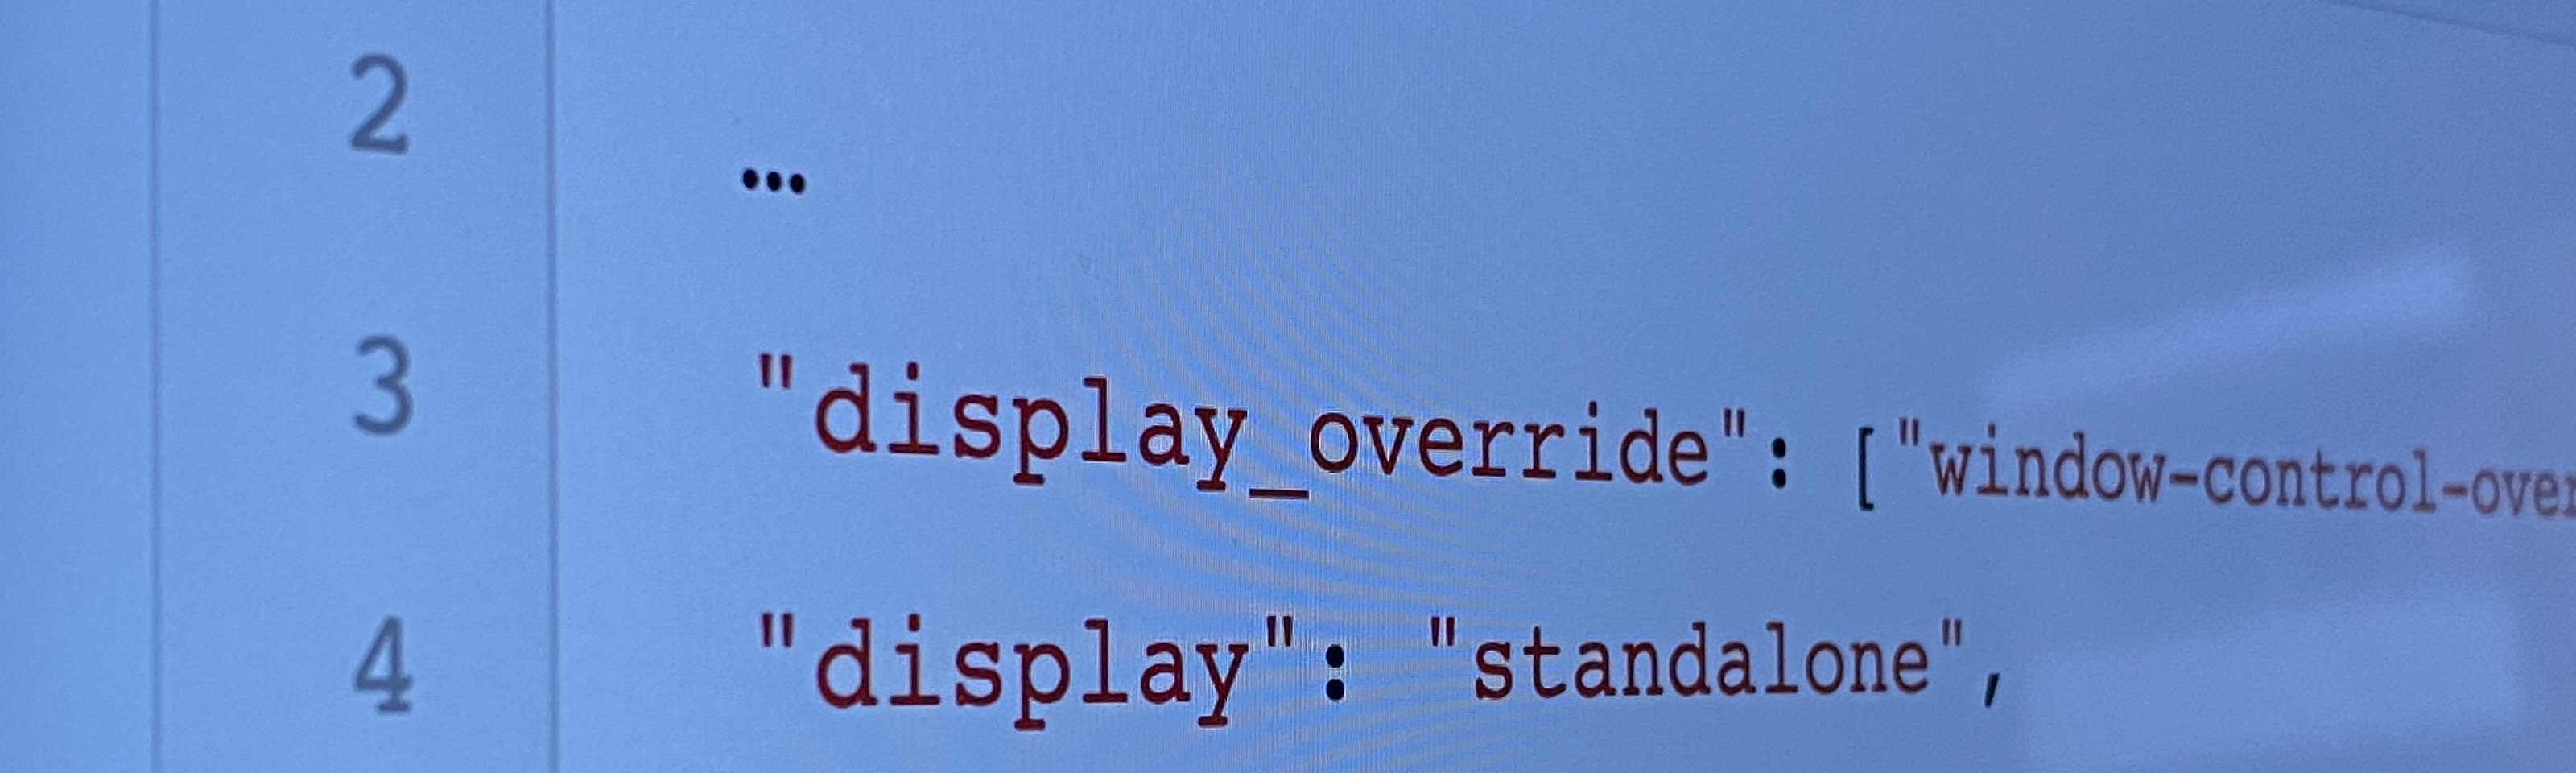 Web App Manifest source code excerpt.